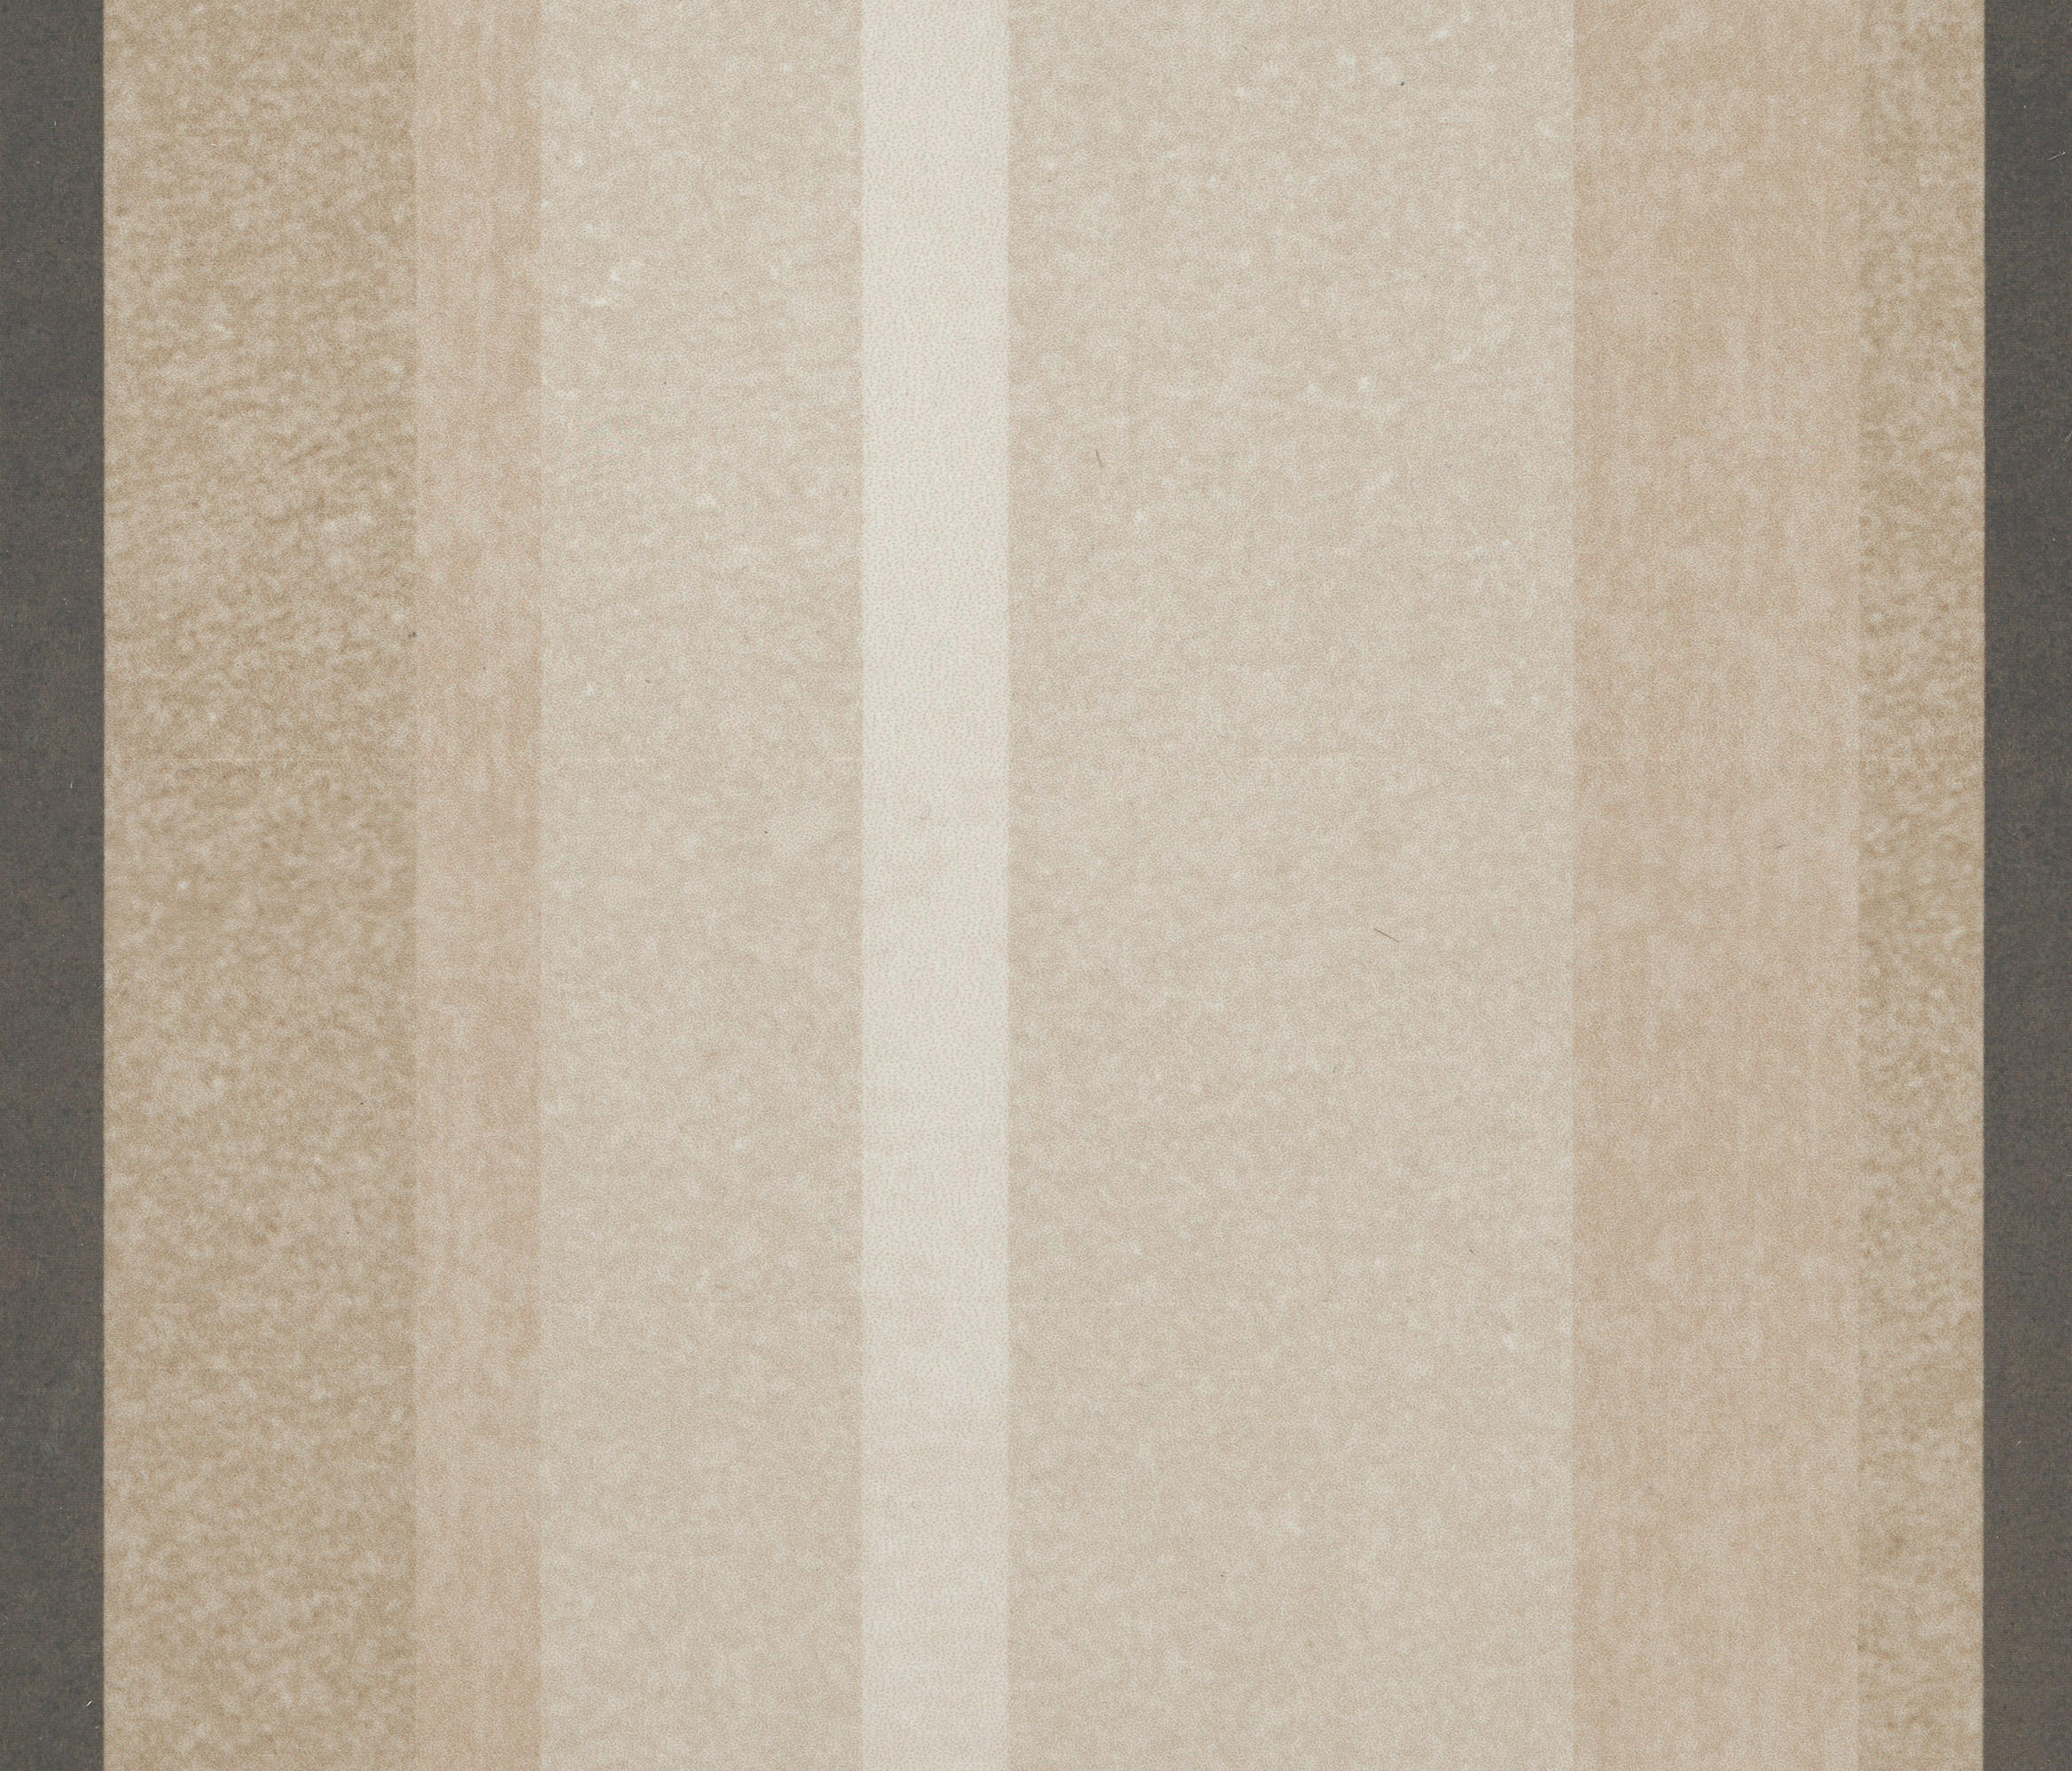 century unlimited cf1b tiles from villeroy boch. Black Bedroom Furniture Sets. Home Design Ideas